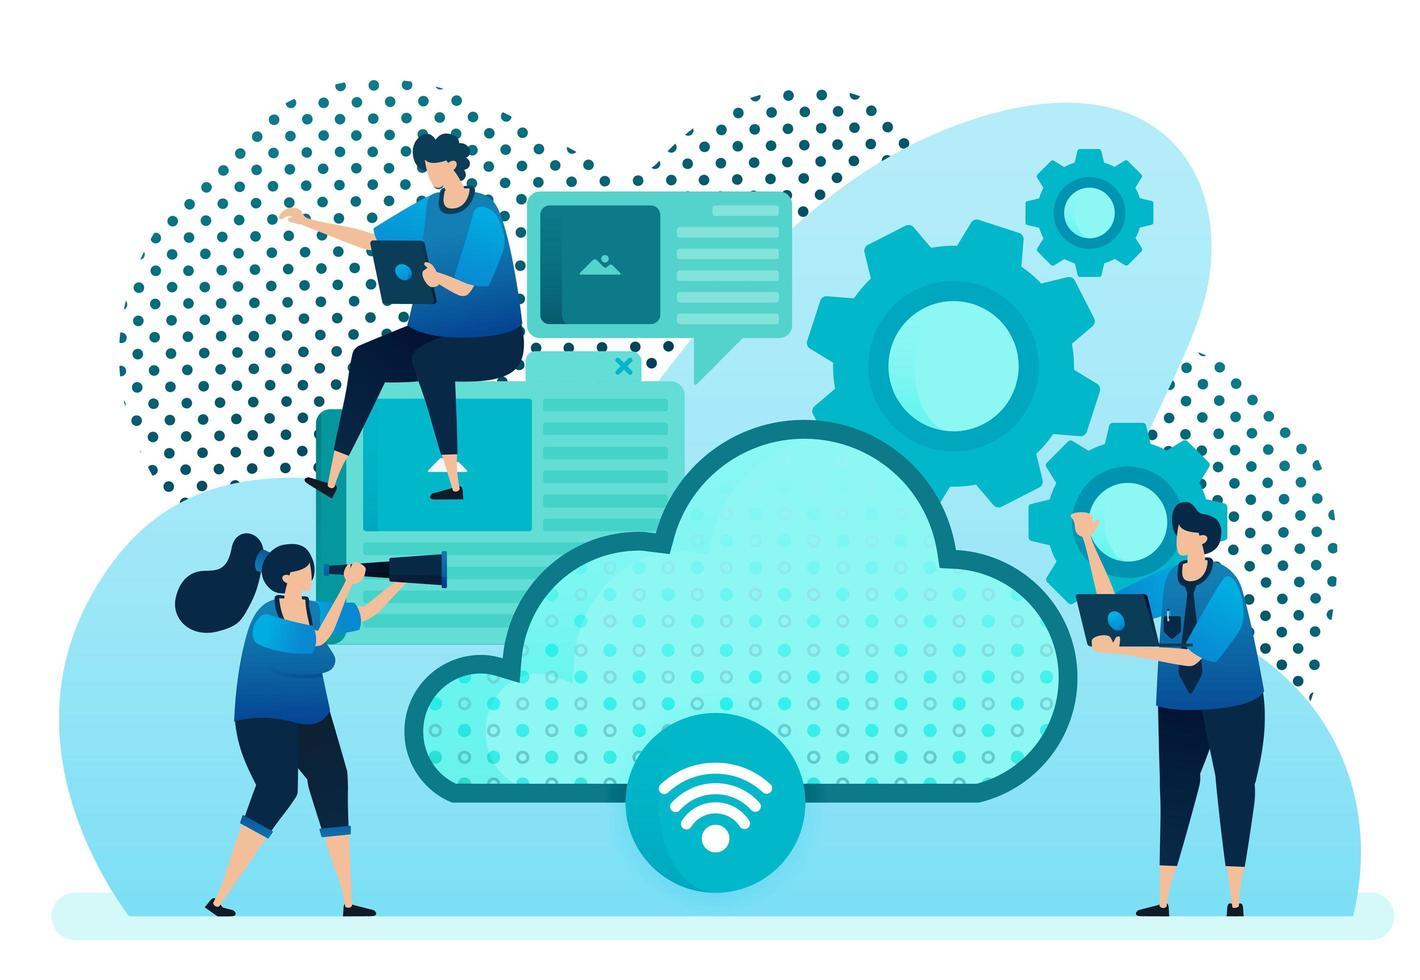 Vector illustration for cloud provider for network, internet connection, communication, hosting server, data center. Design can be used for landing page, template, ui ux, web, website, banner, flyer